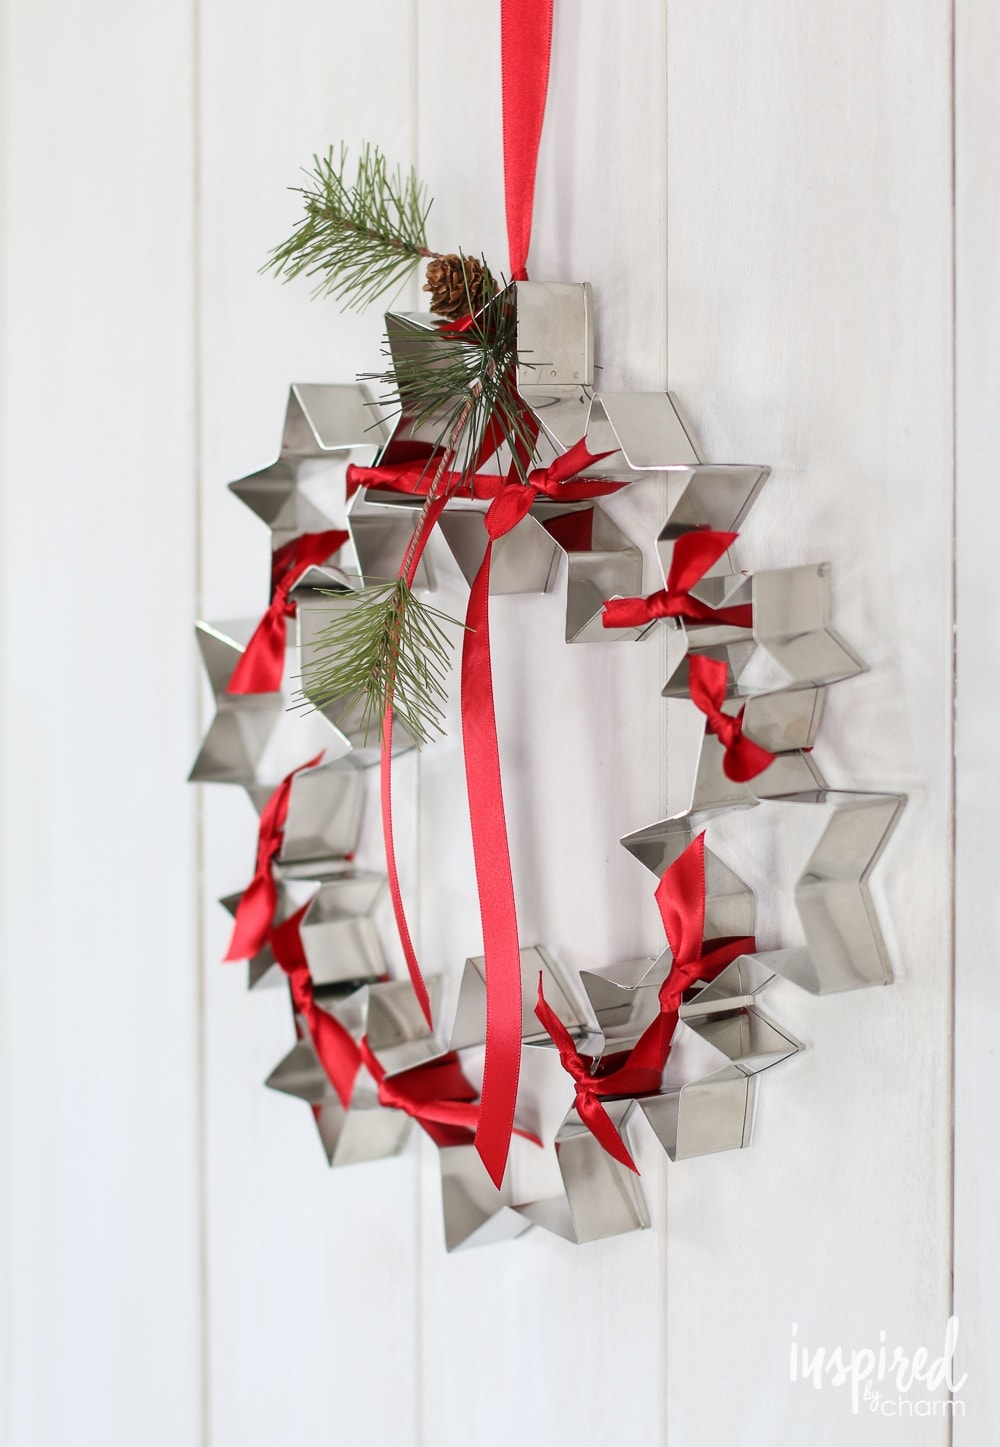 Cookie Cutter Wreath Tutorial